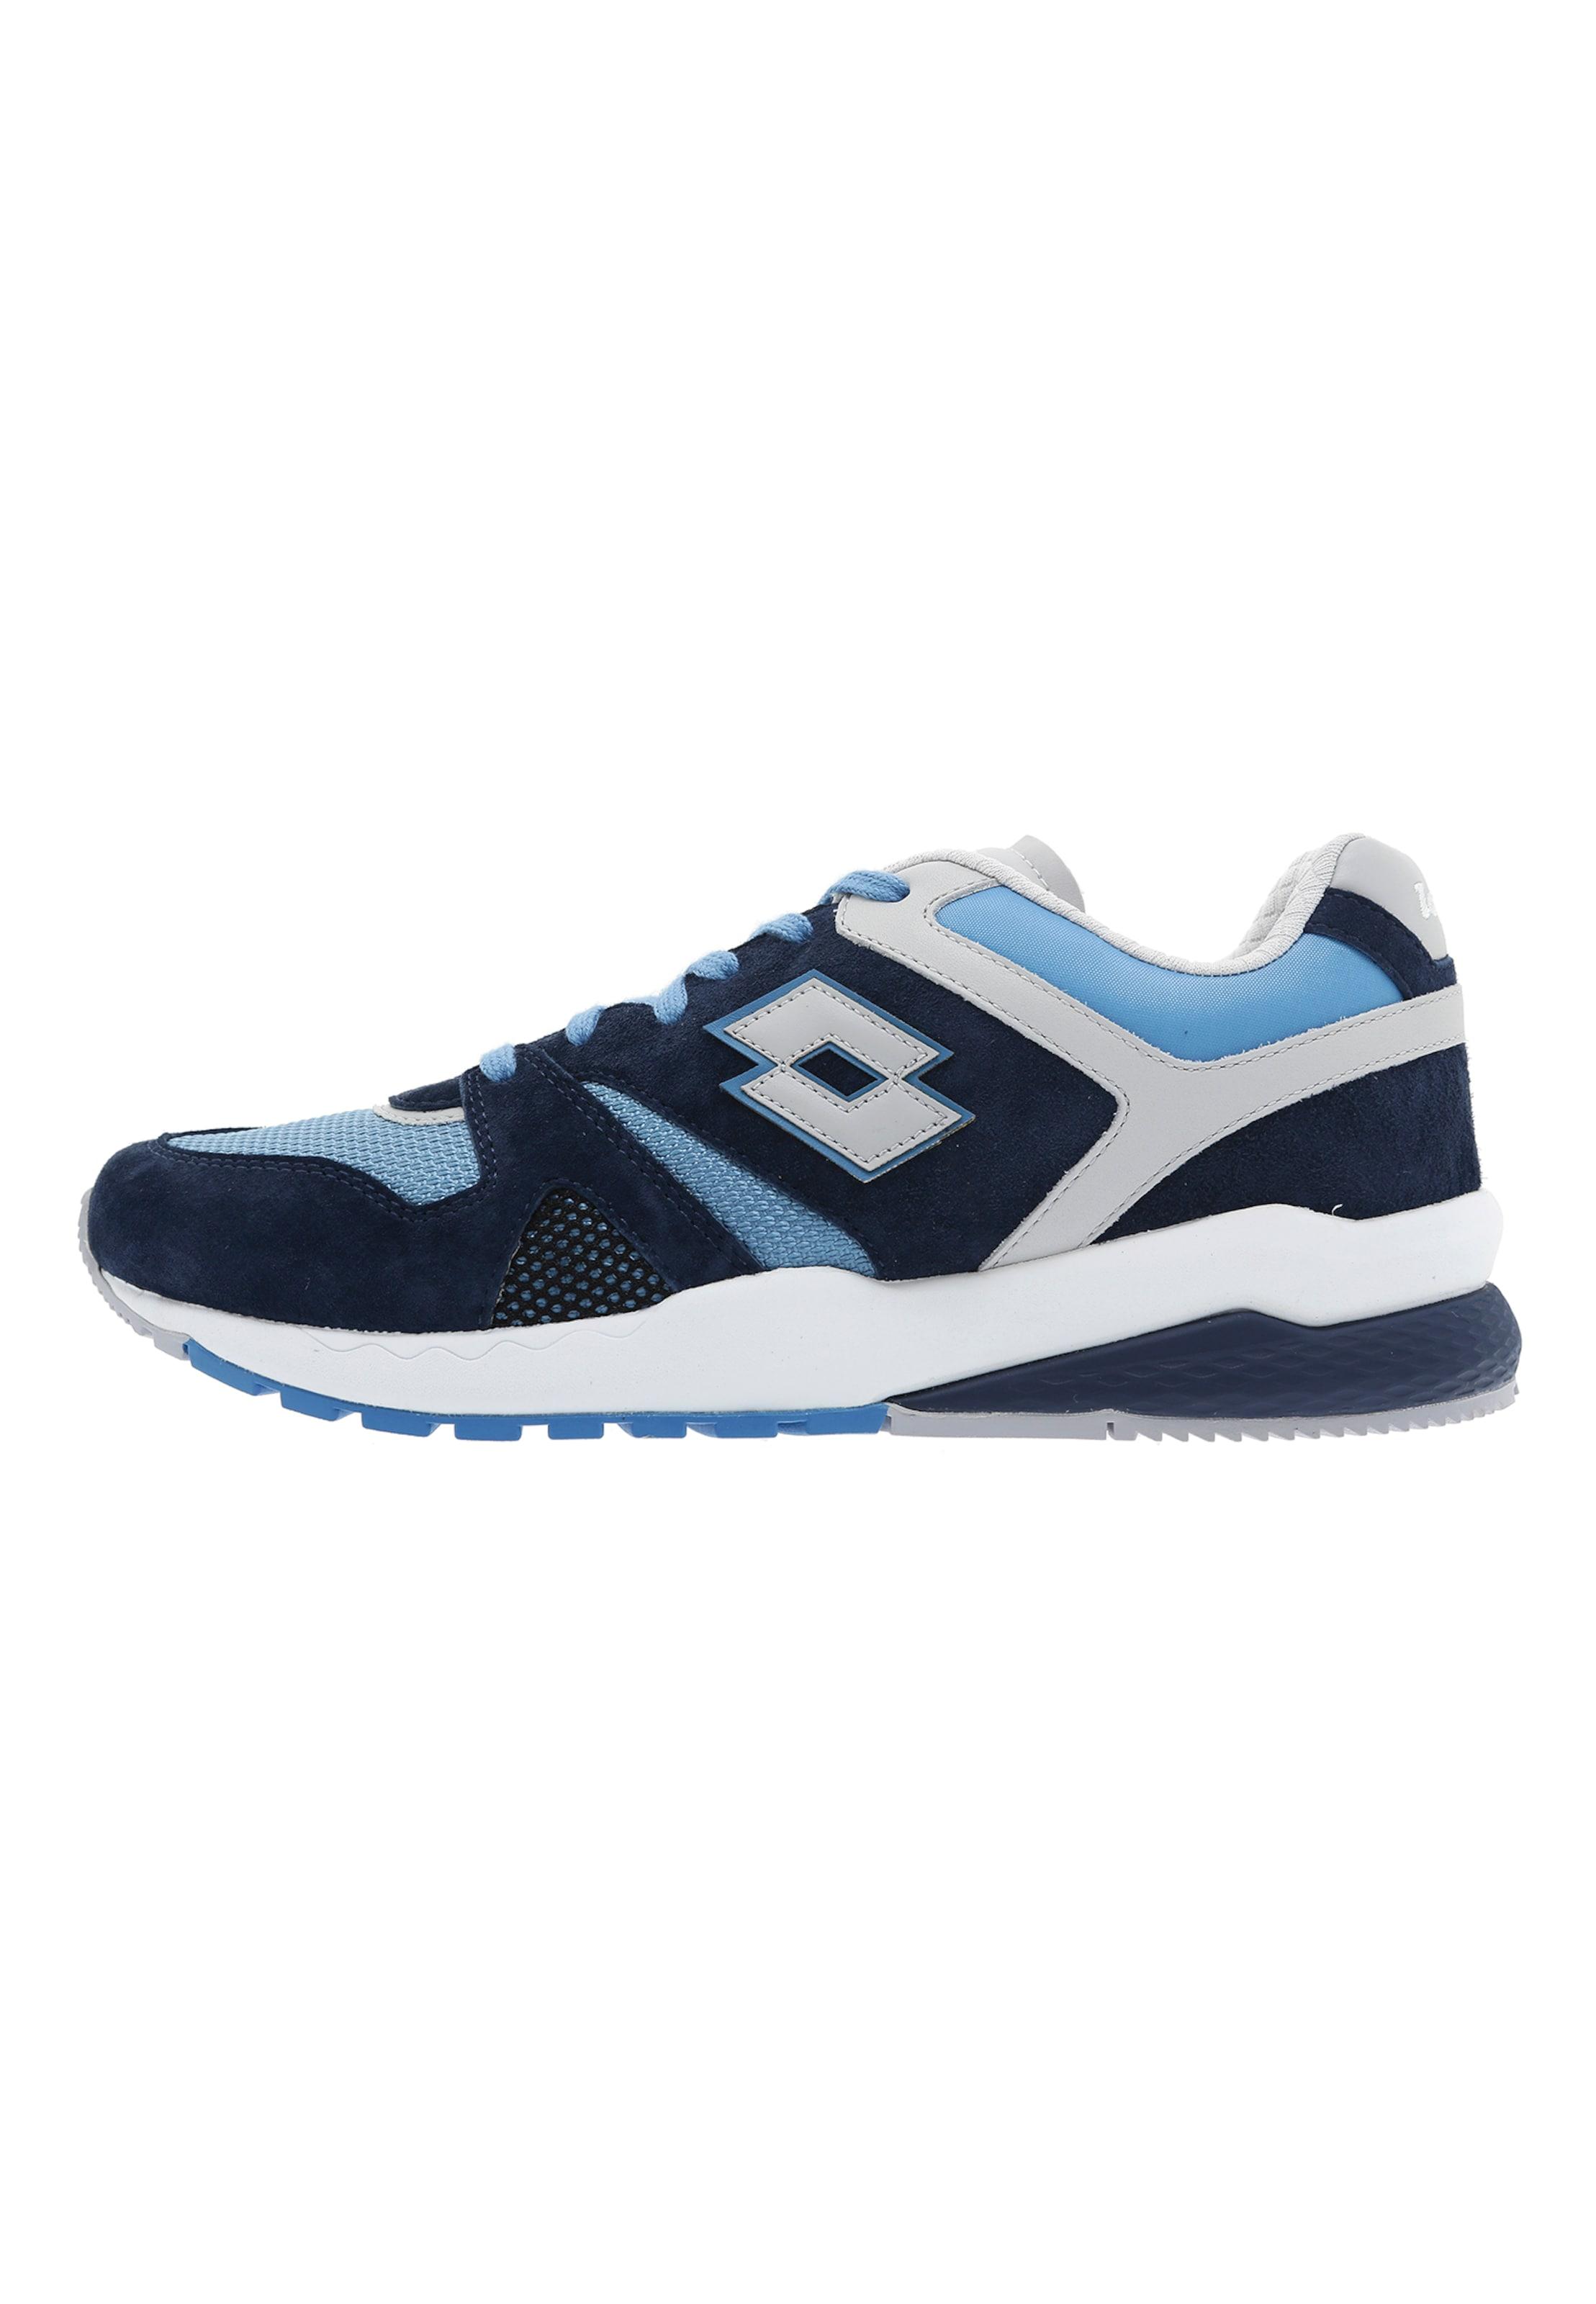 Leggenda In Sneaker Lotto 'marathon' HellblauDunkelblau Hellgrau QrdhCxts